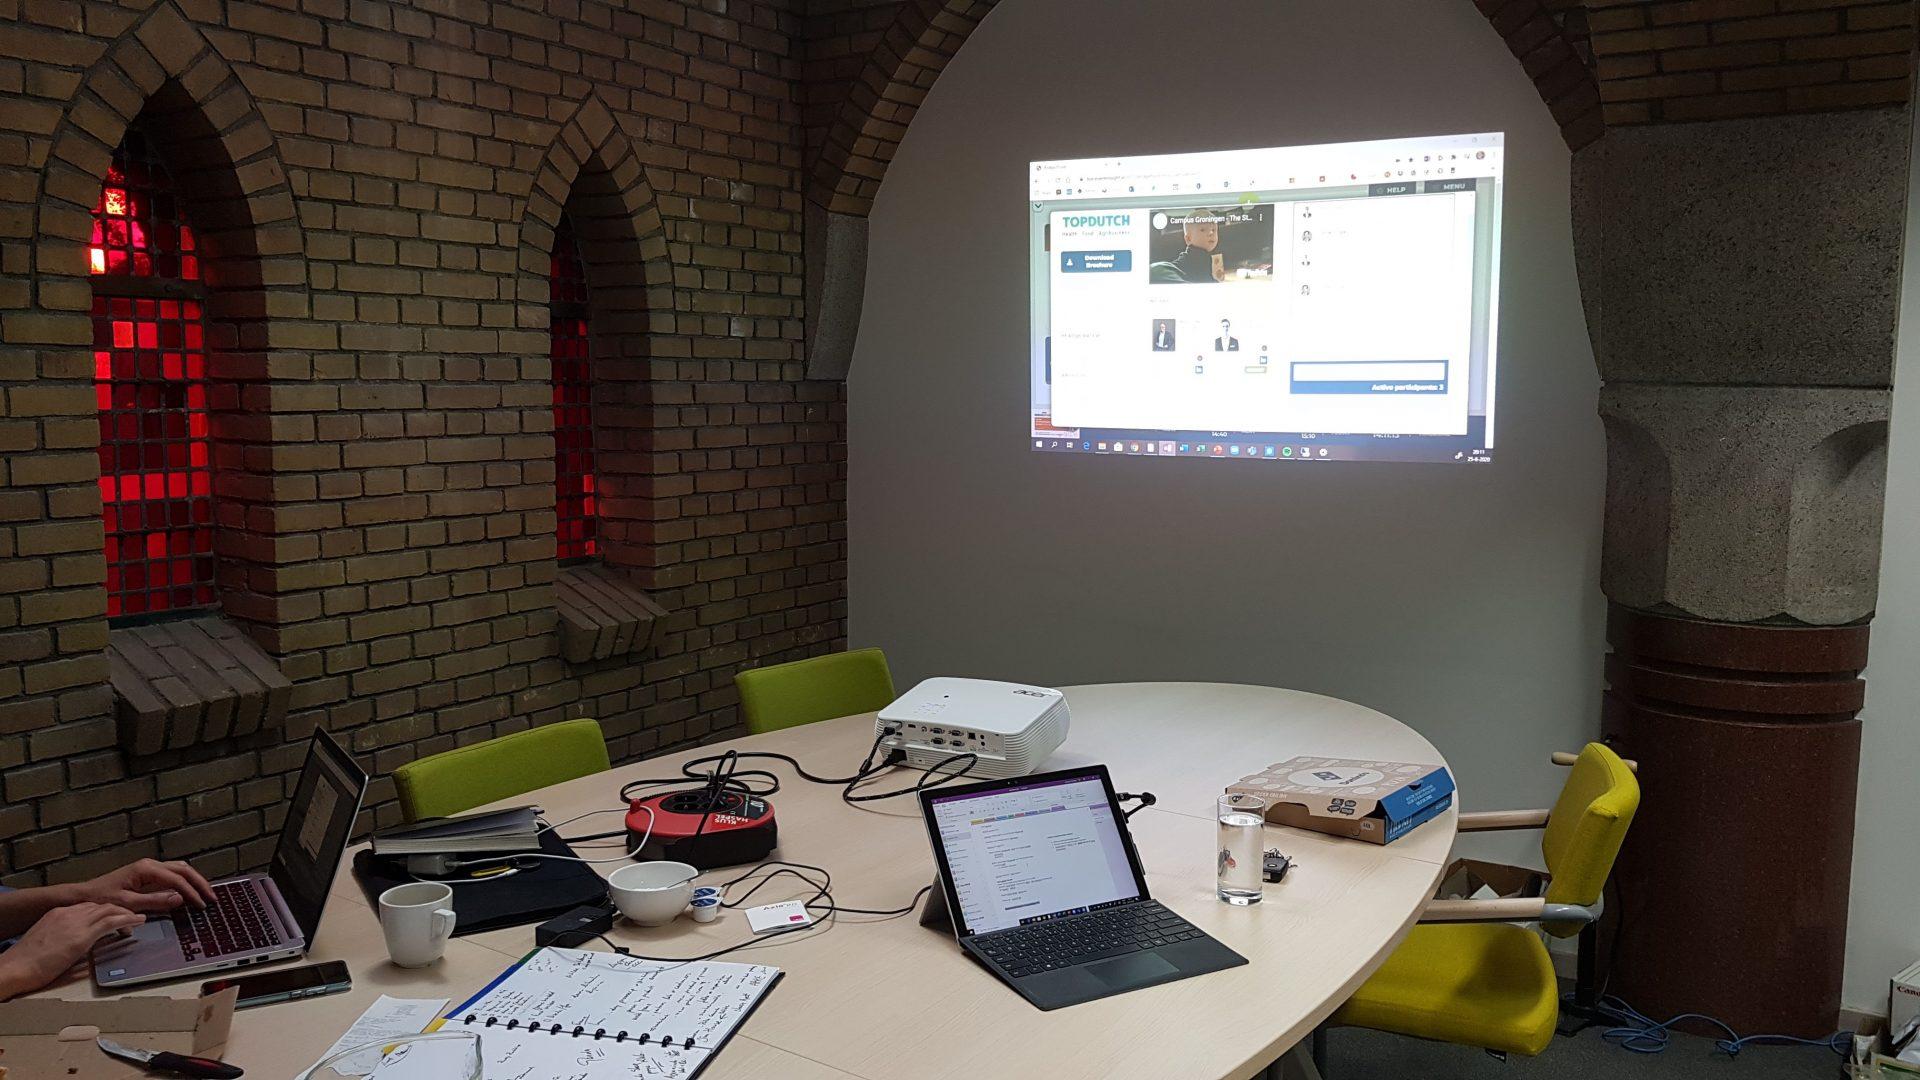 Virtuele conferentie over plantaardige eiwitten 'Ons verhaal bleek aan te slaan'